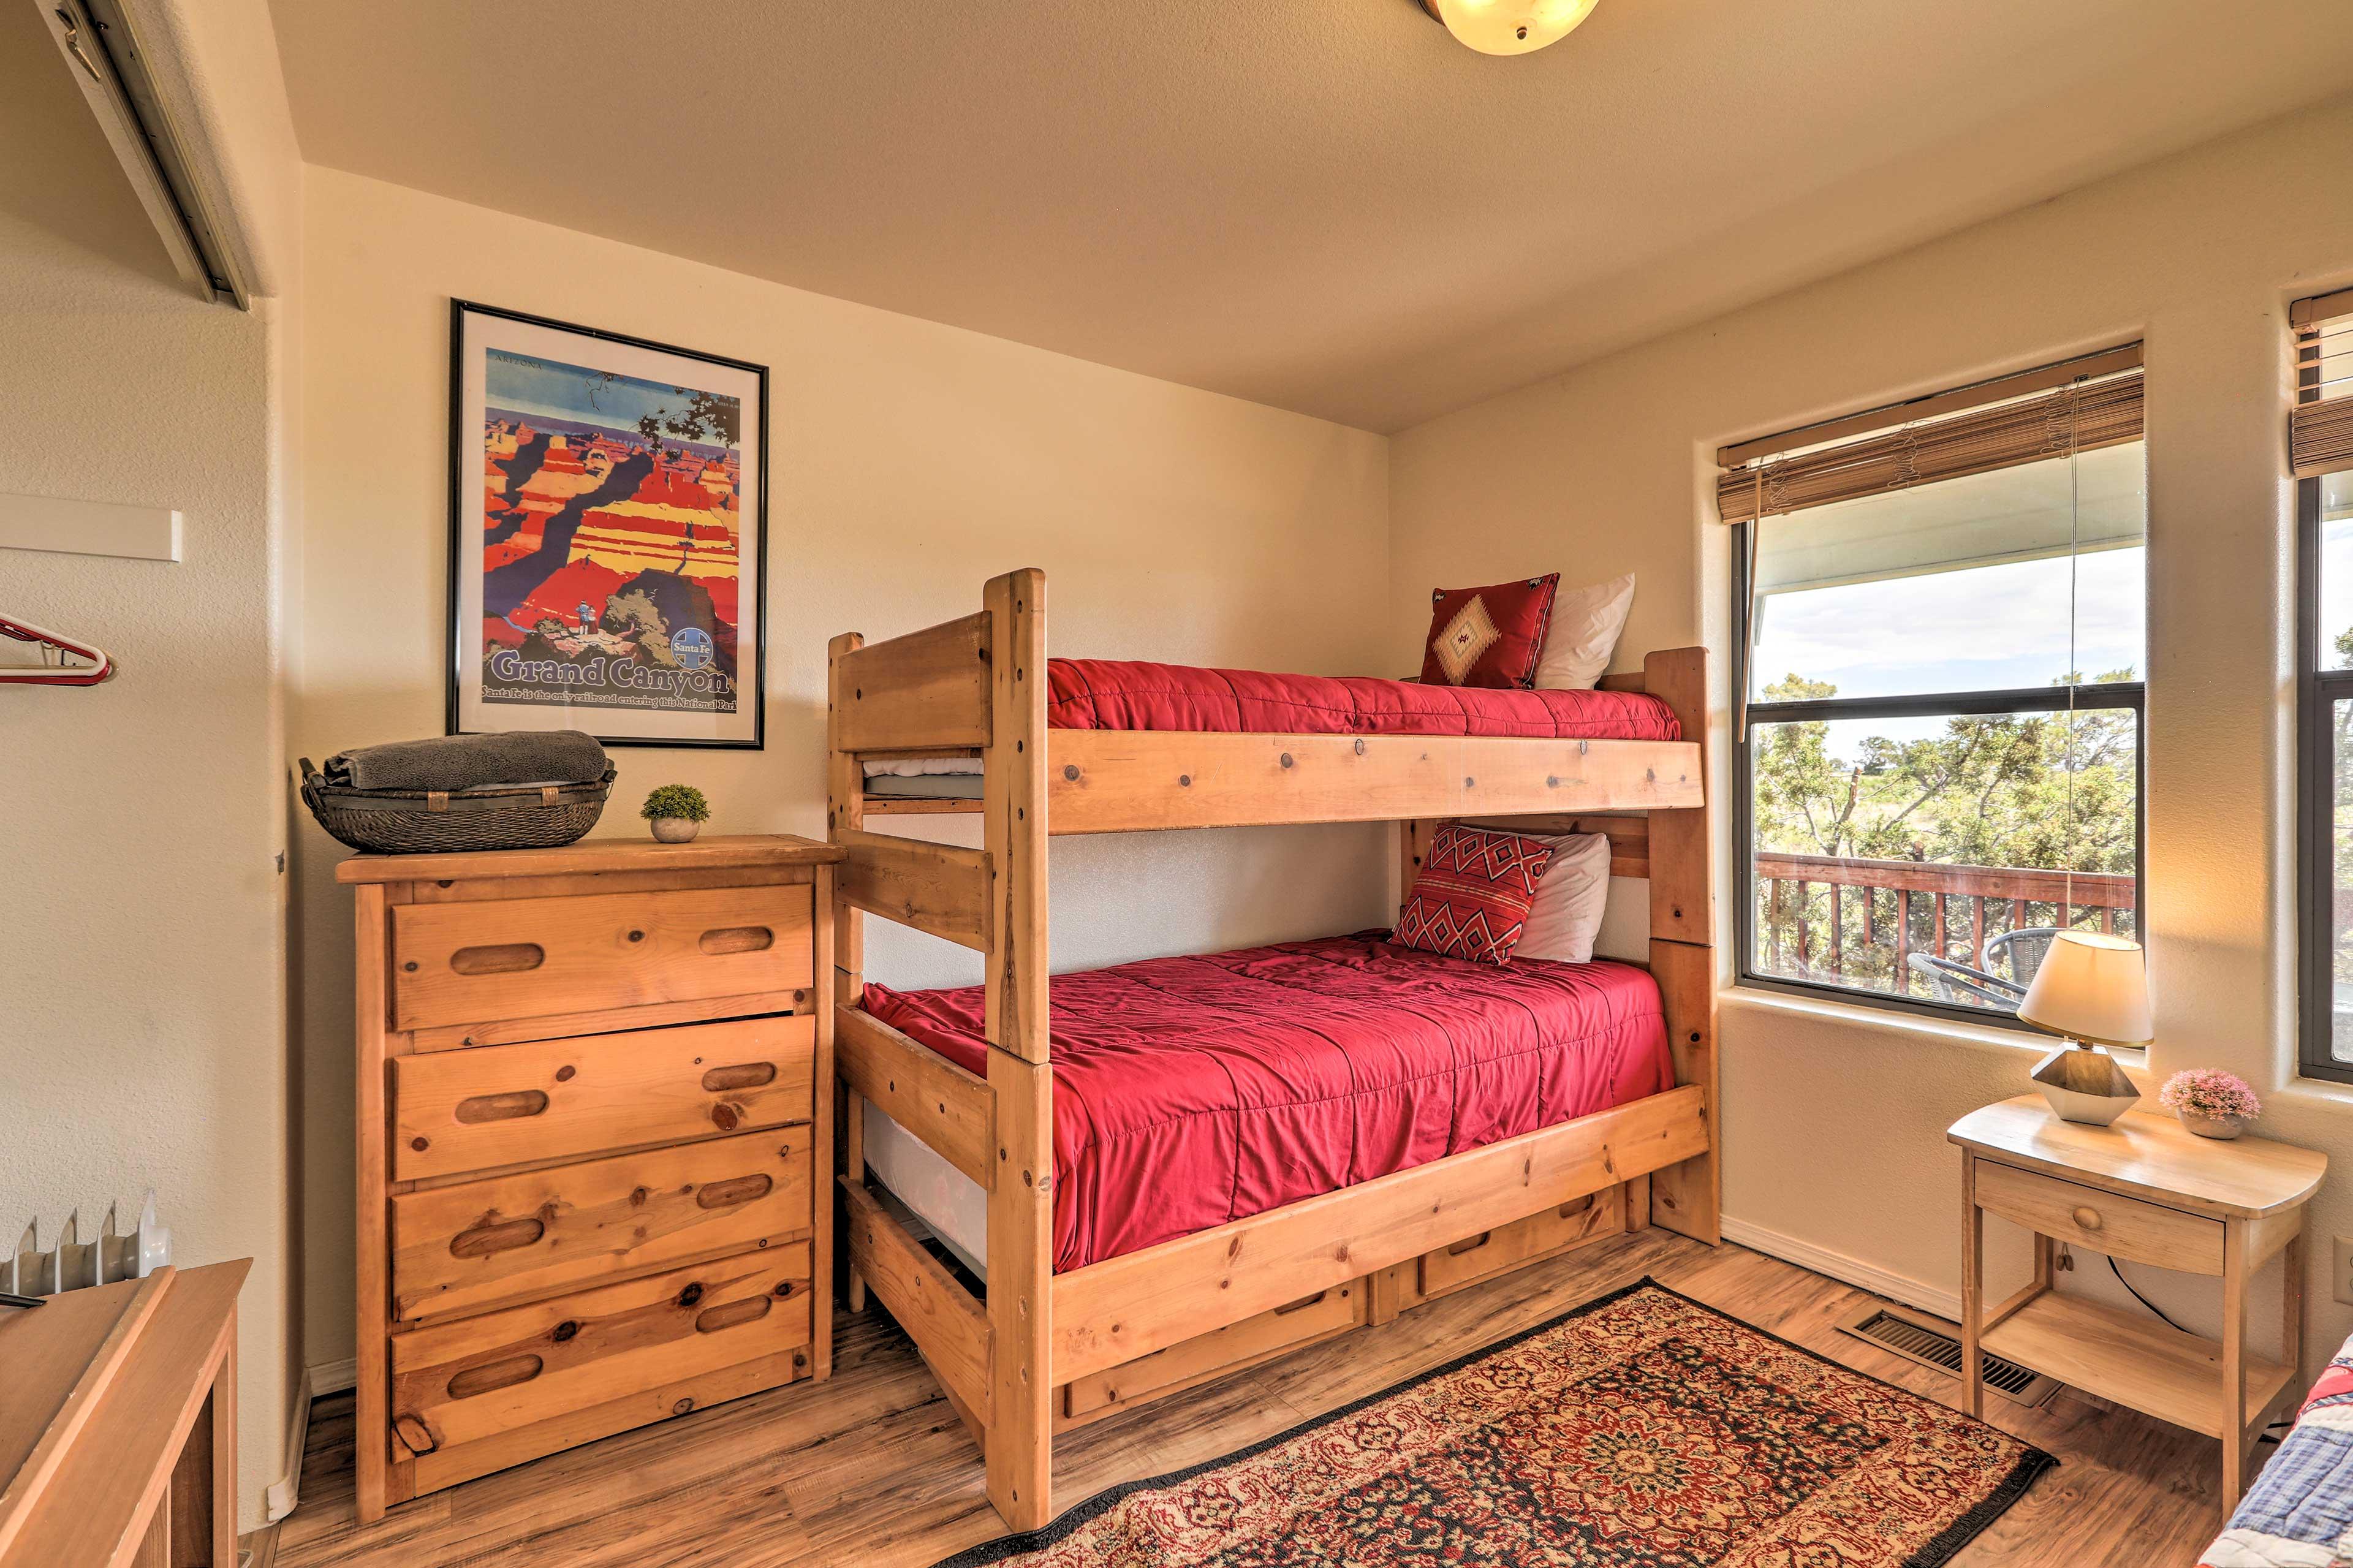 Bedroom 3 | Twin Bunk Bed, Twin Bed